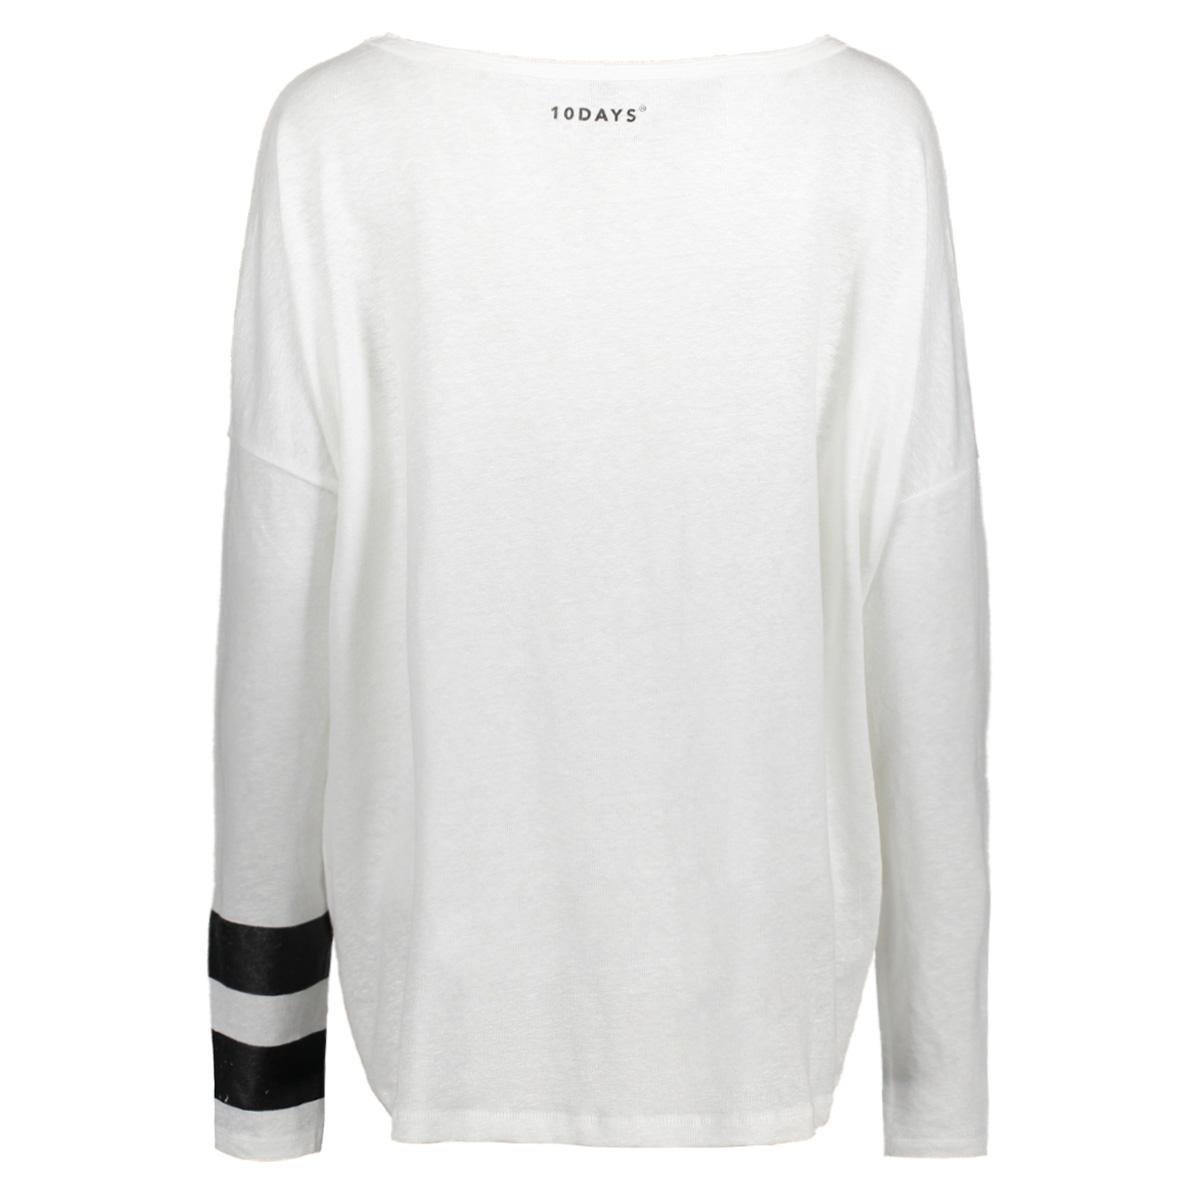 20-772-7103 10 days t-shirt white